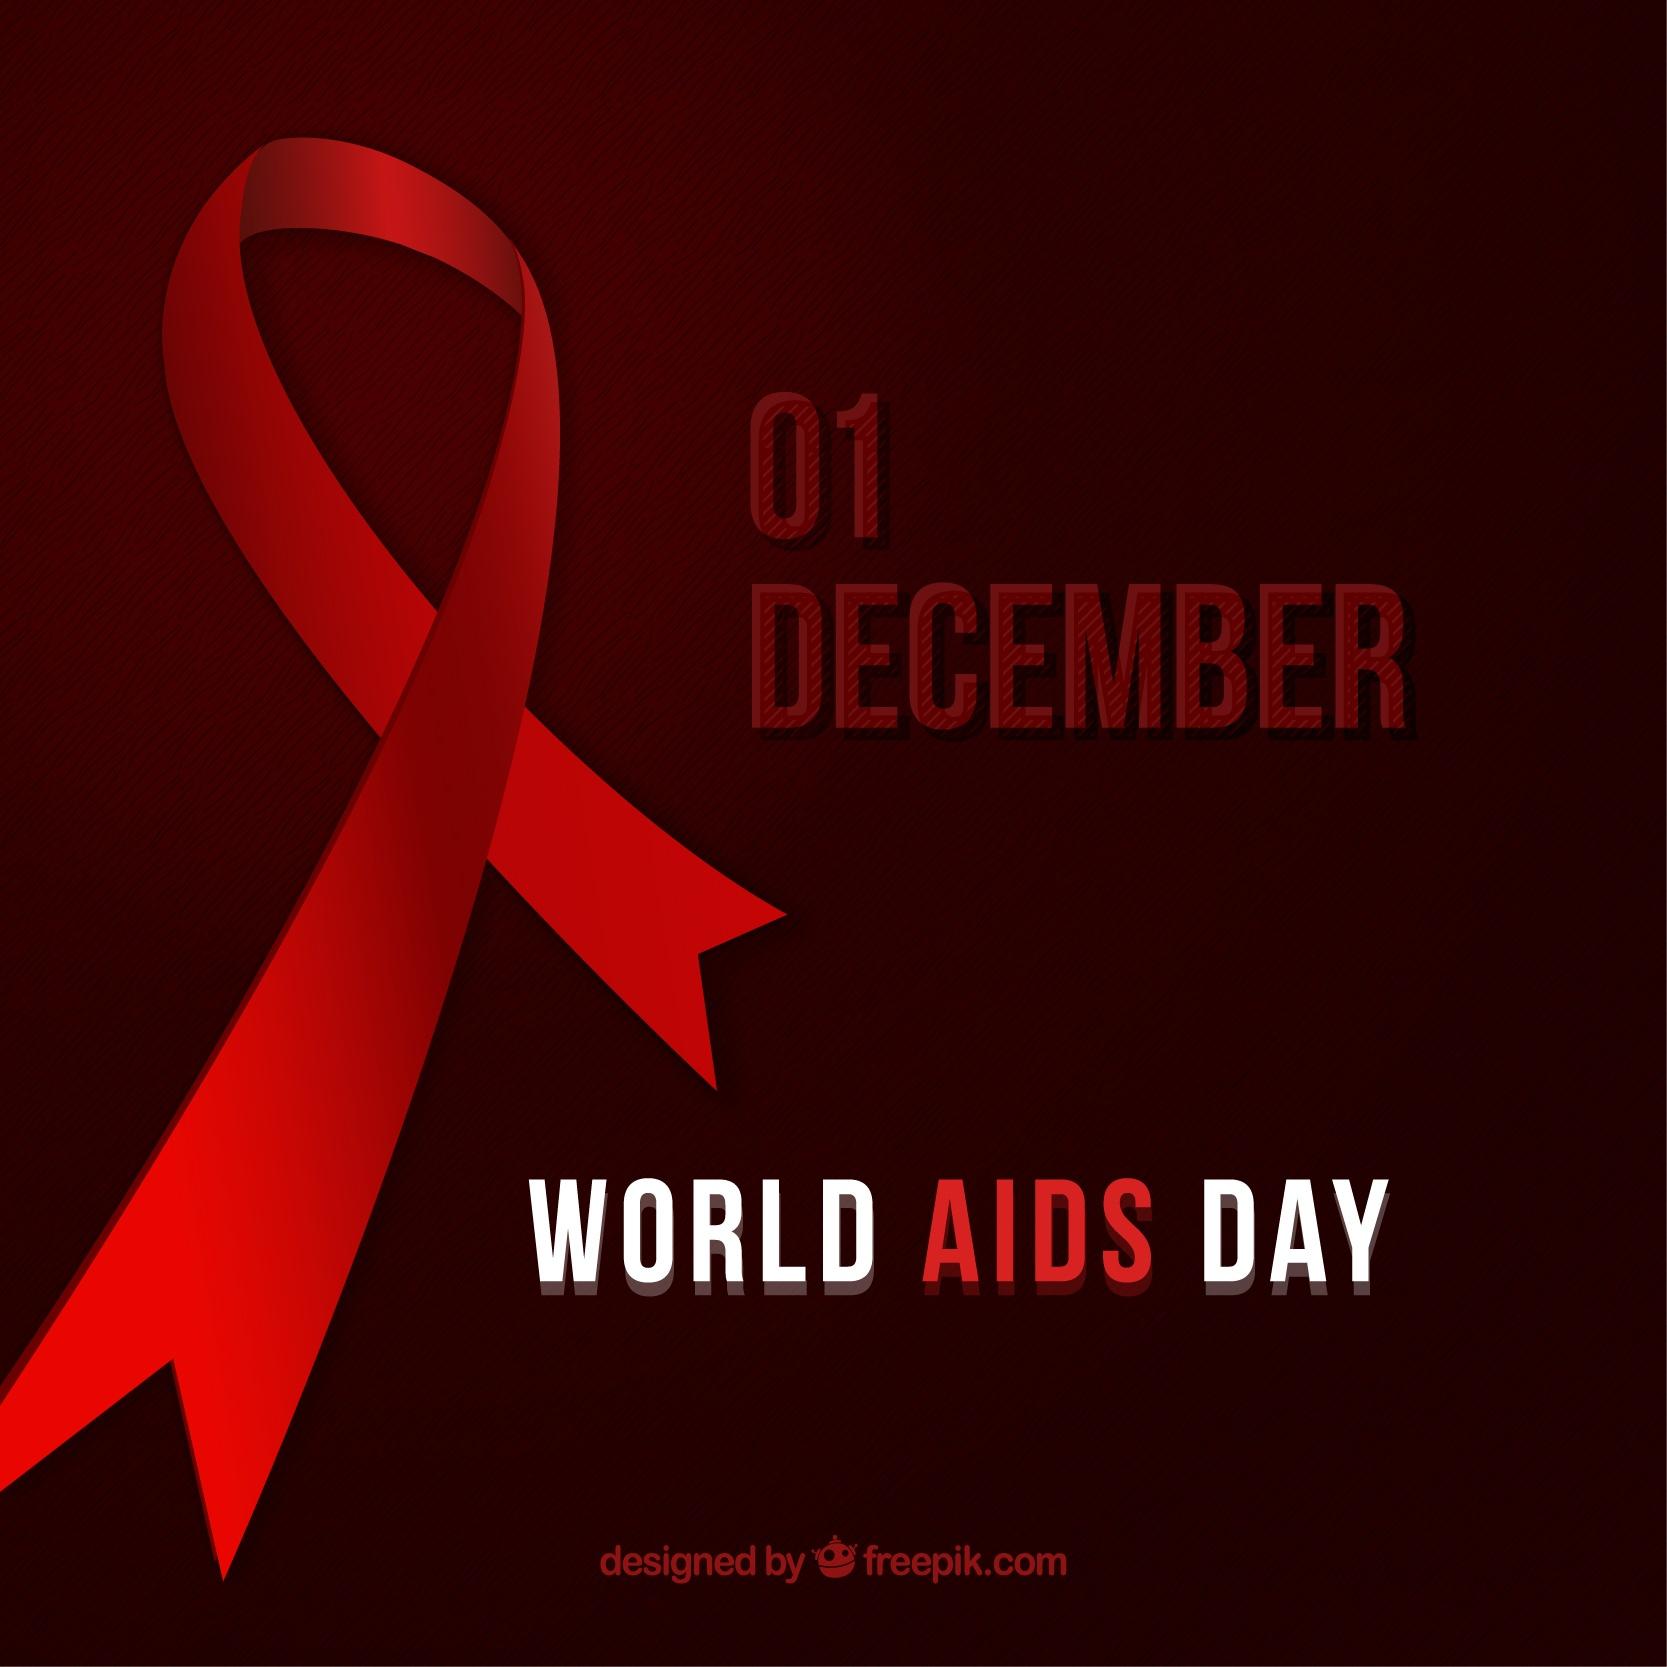 WAD-World-Aids-Day-2015